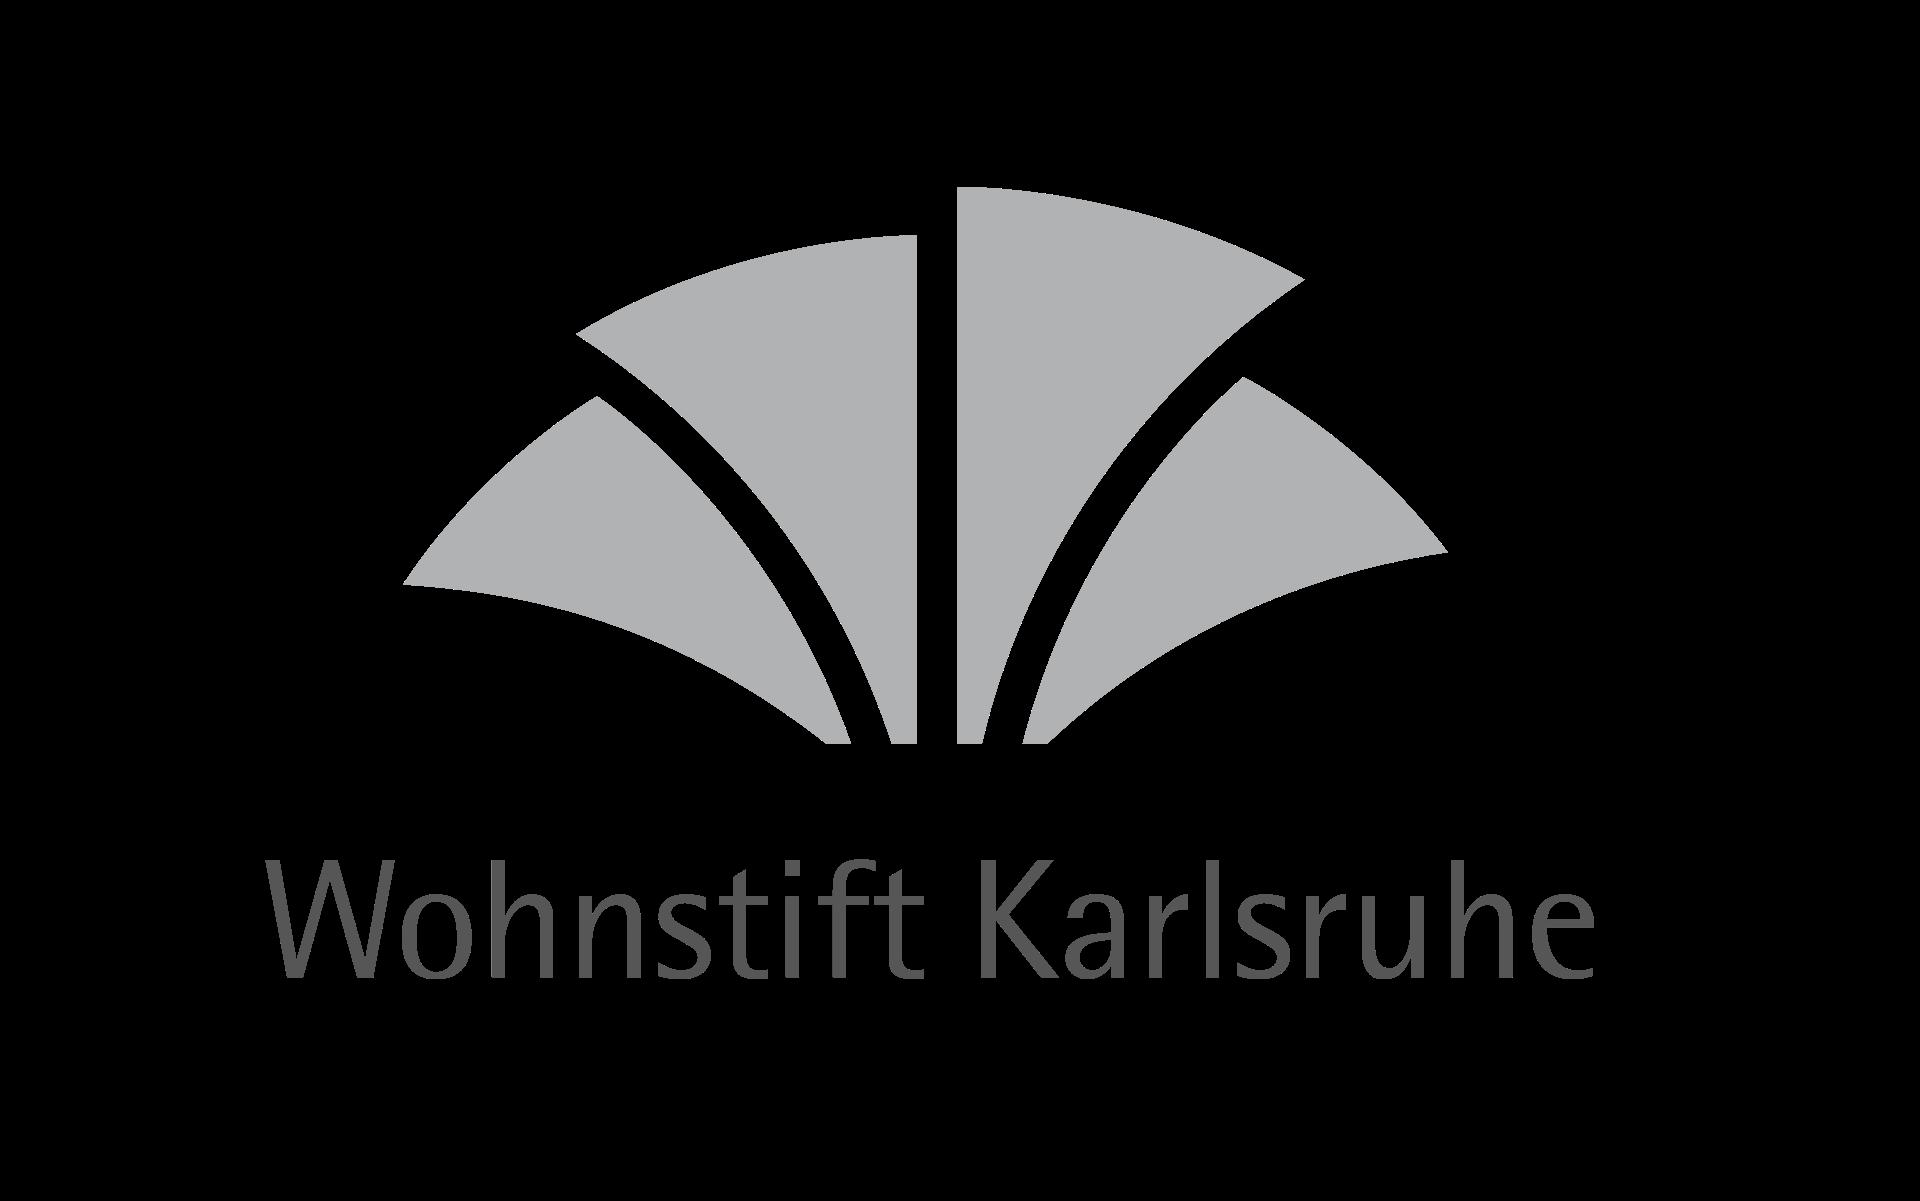 Wohnstift Karlsruhe e. V.